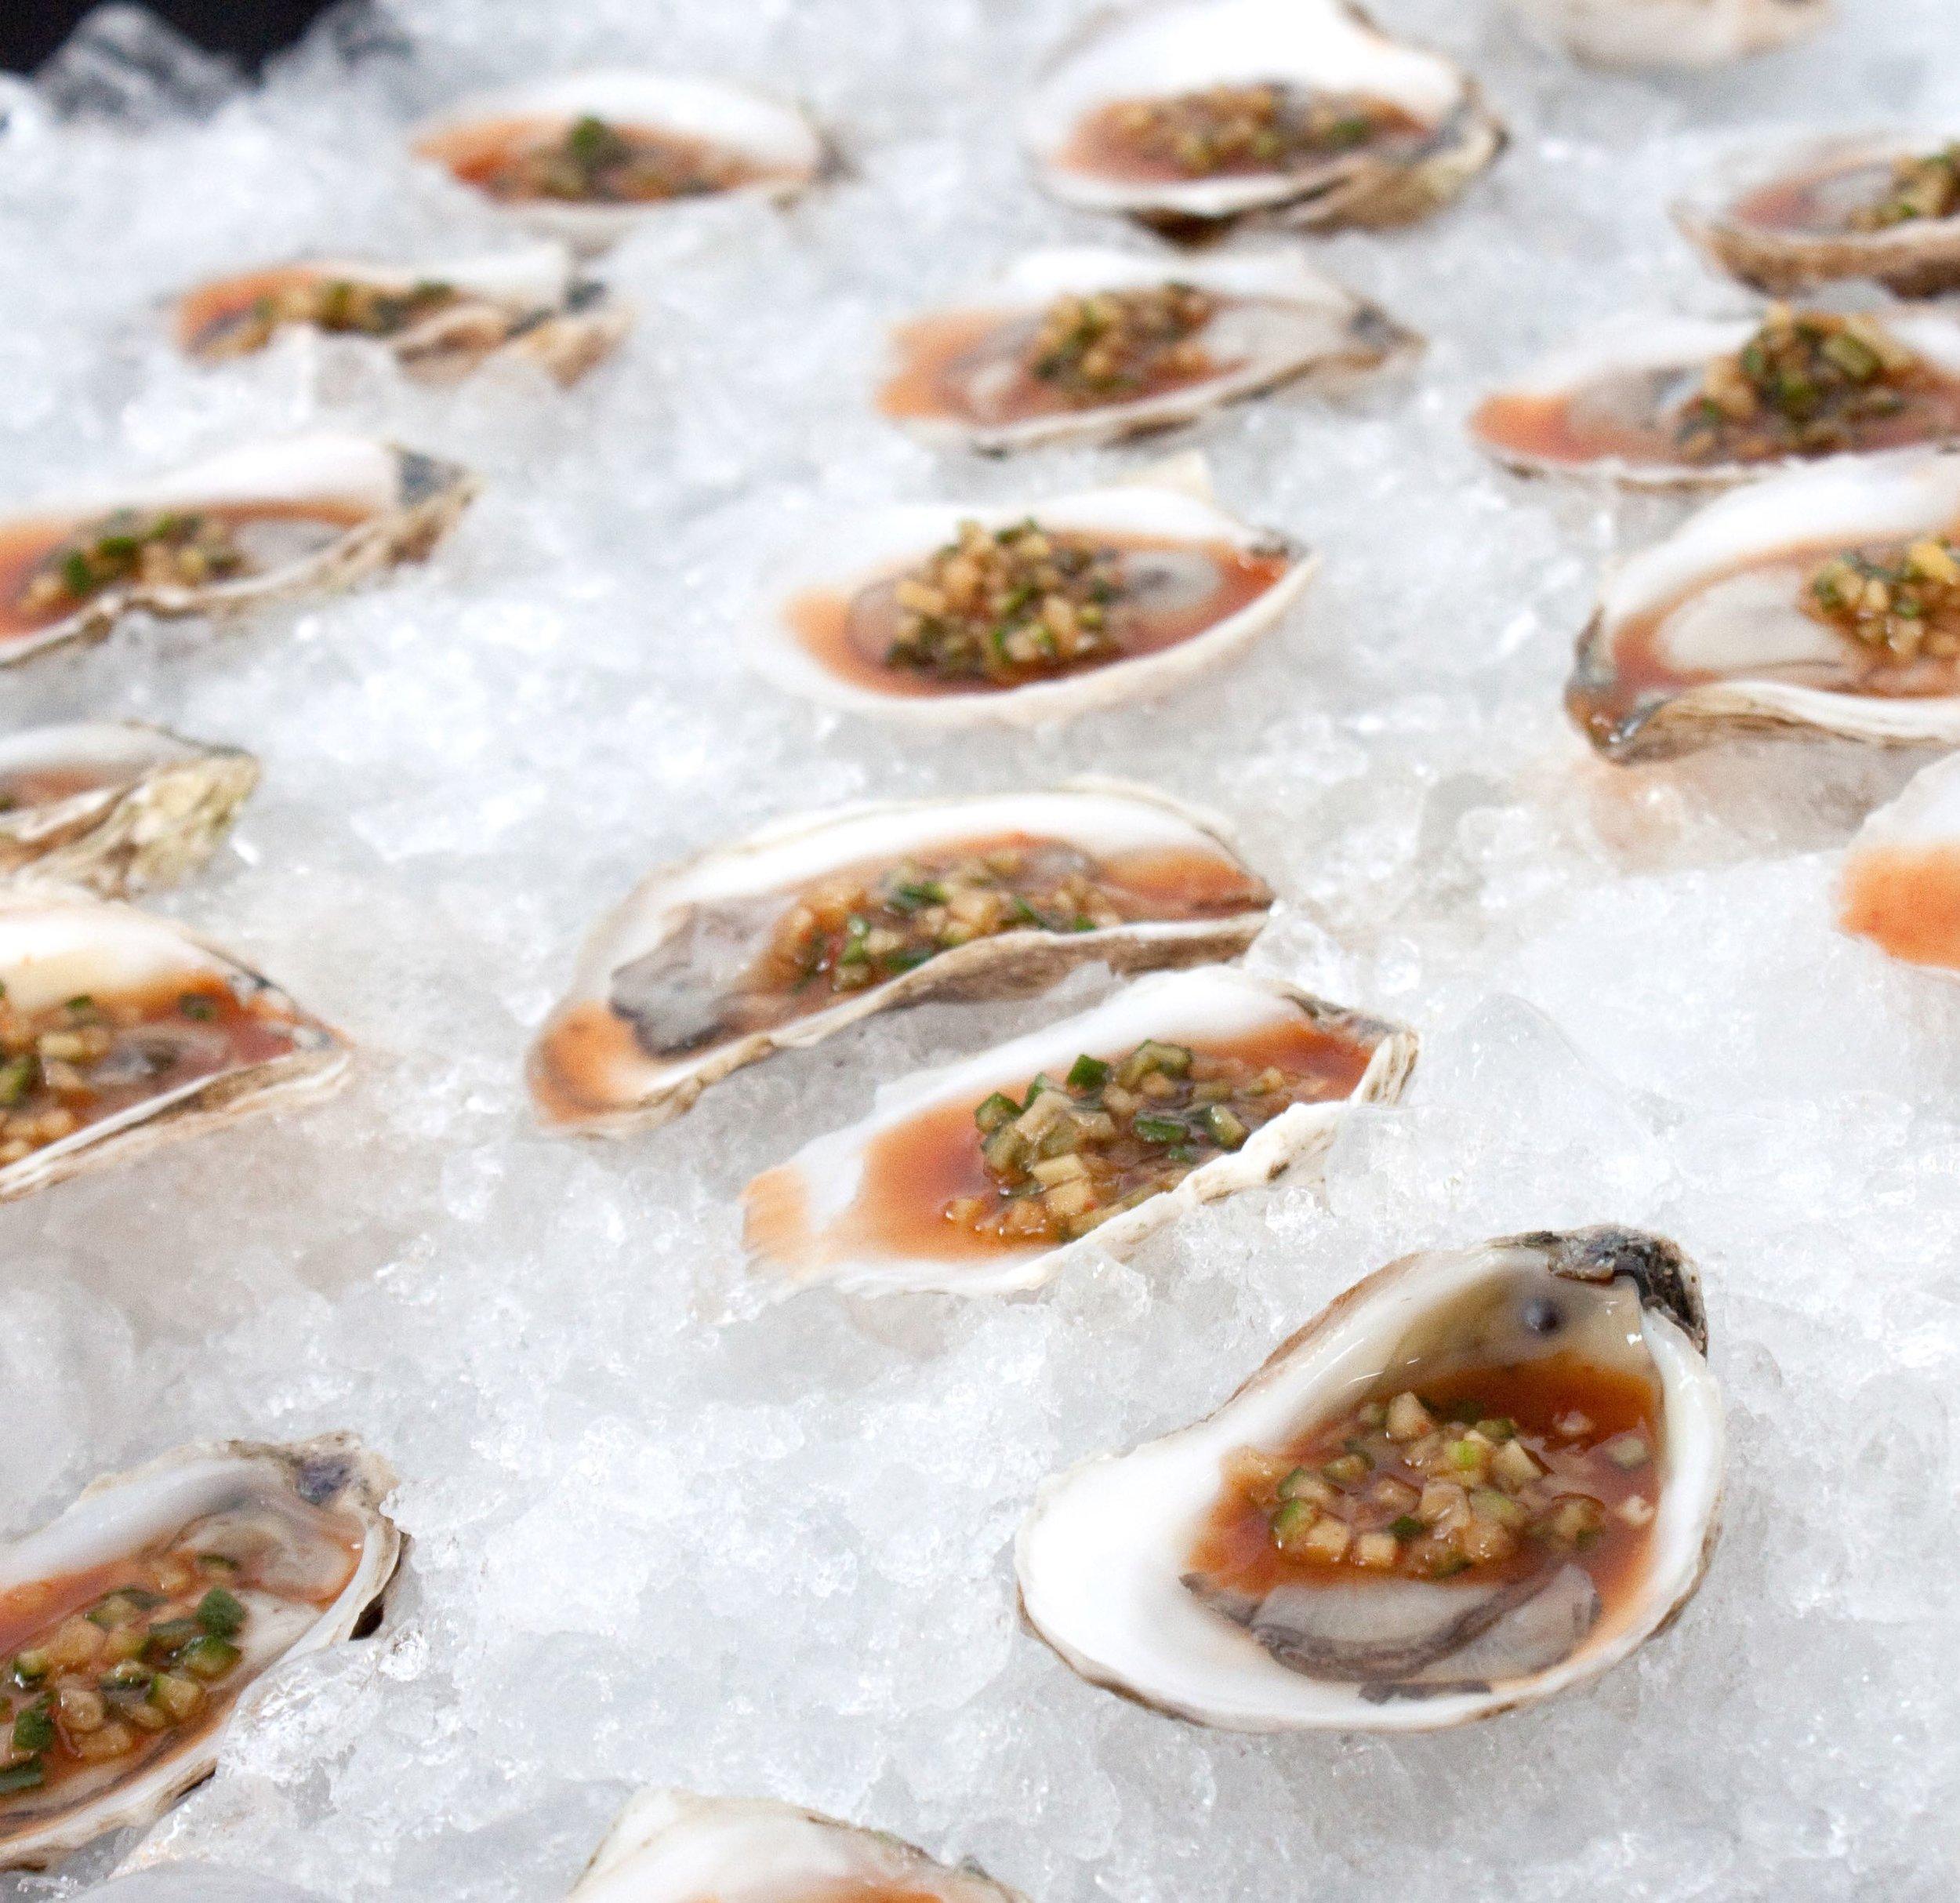 oyster_closeup_sq.jpg